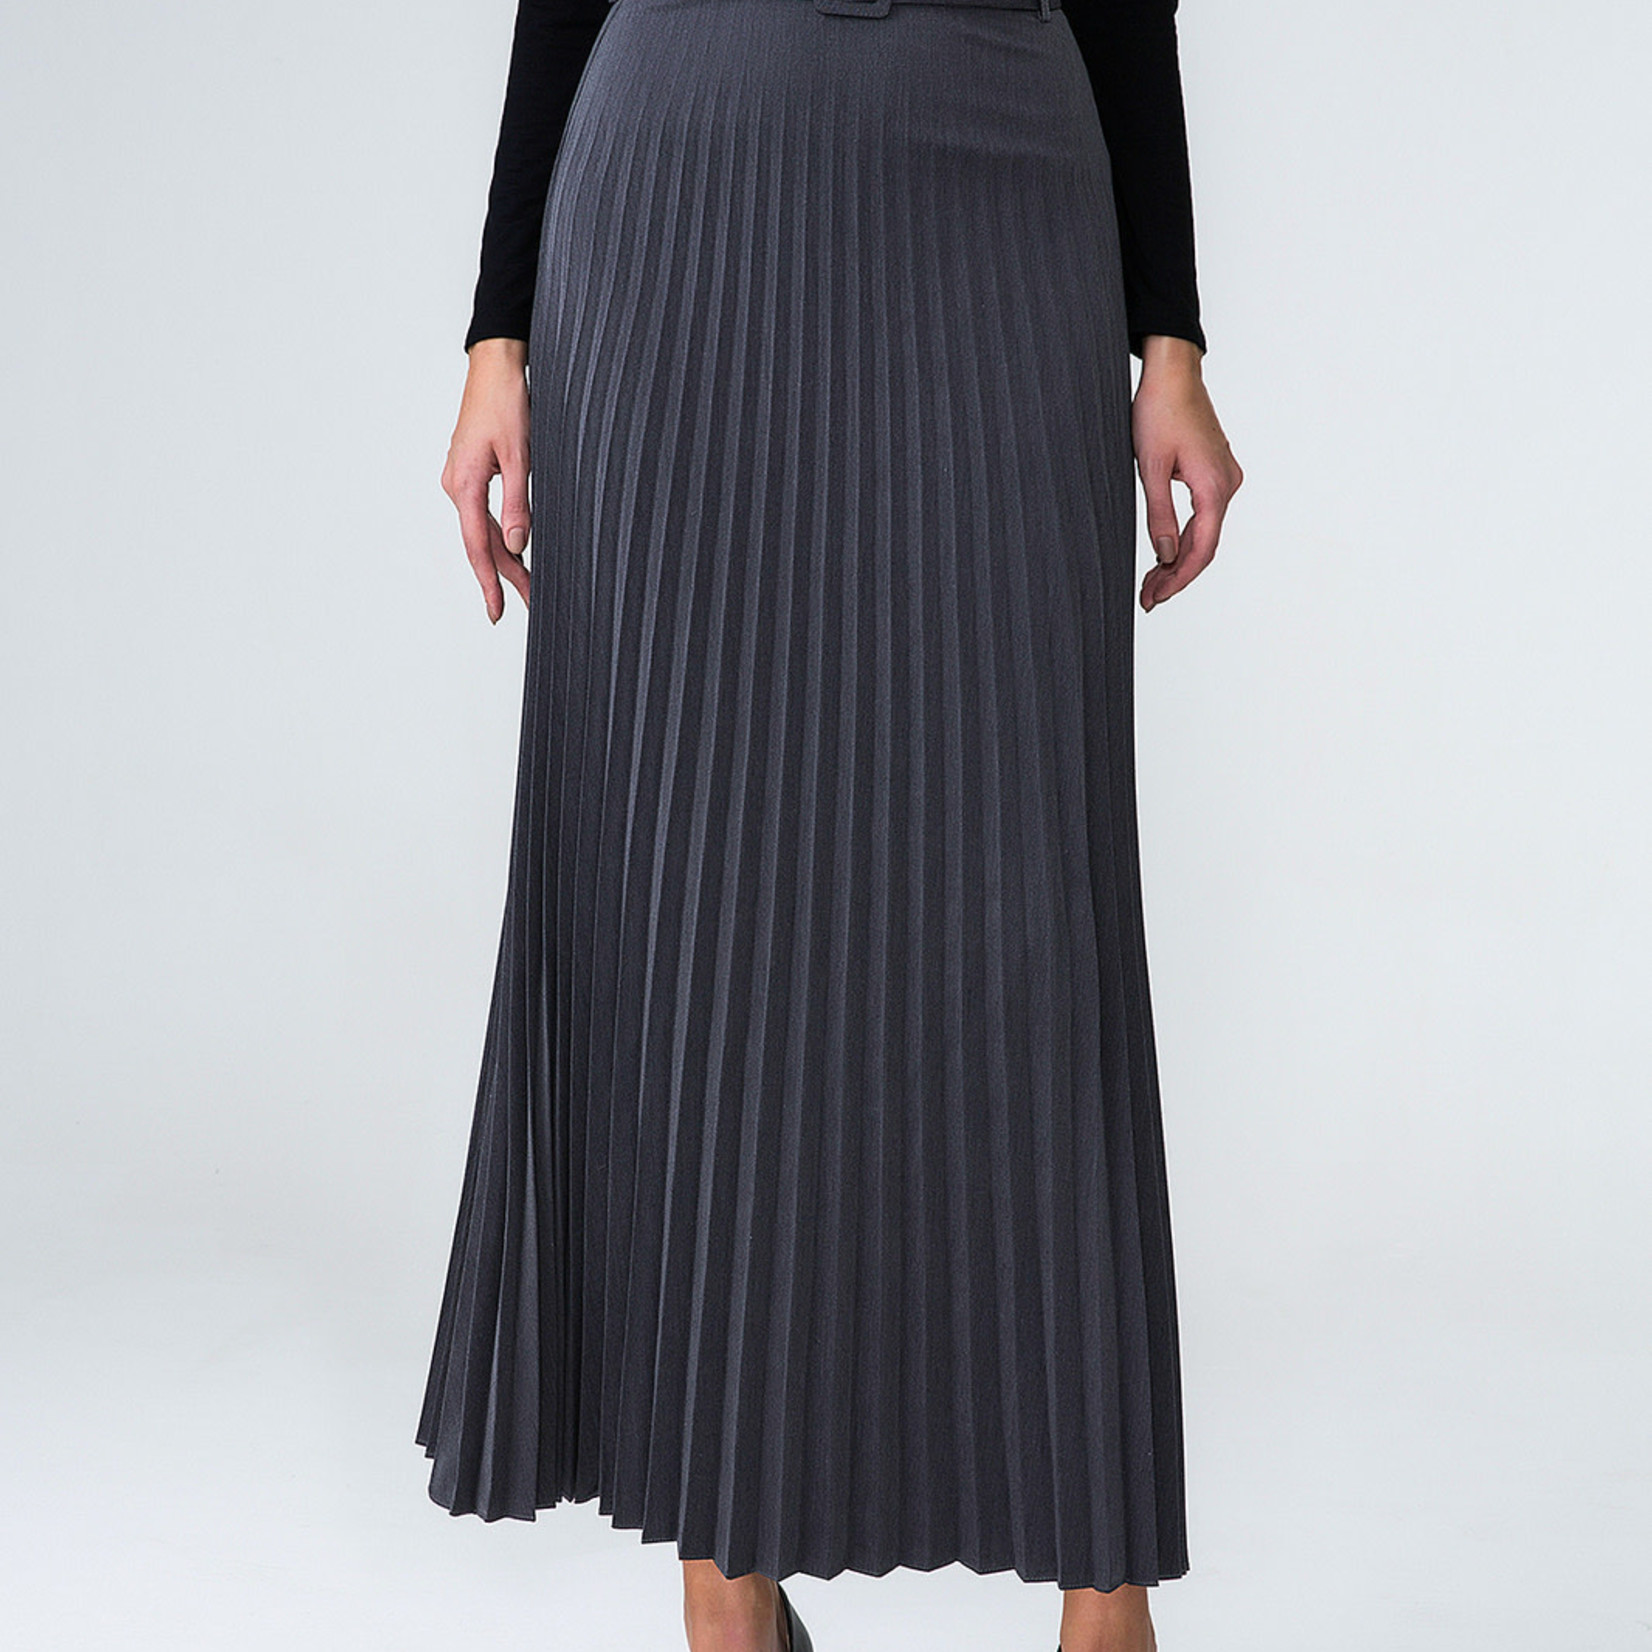 Hijab House Grey Pleated Skirt